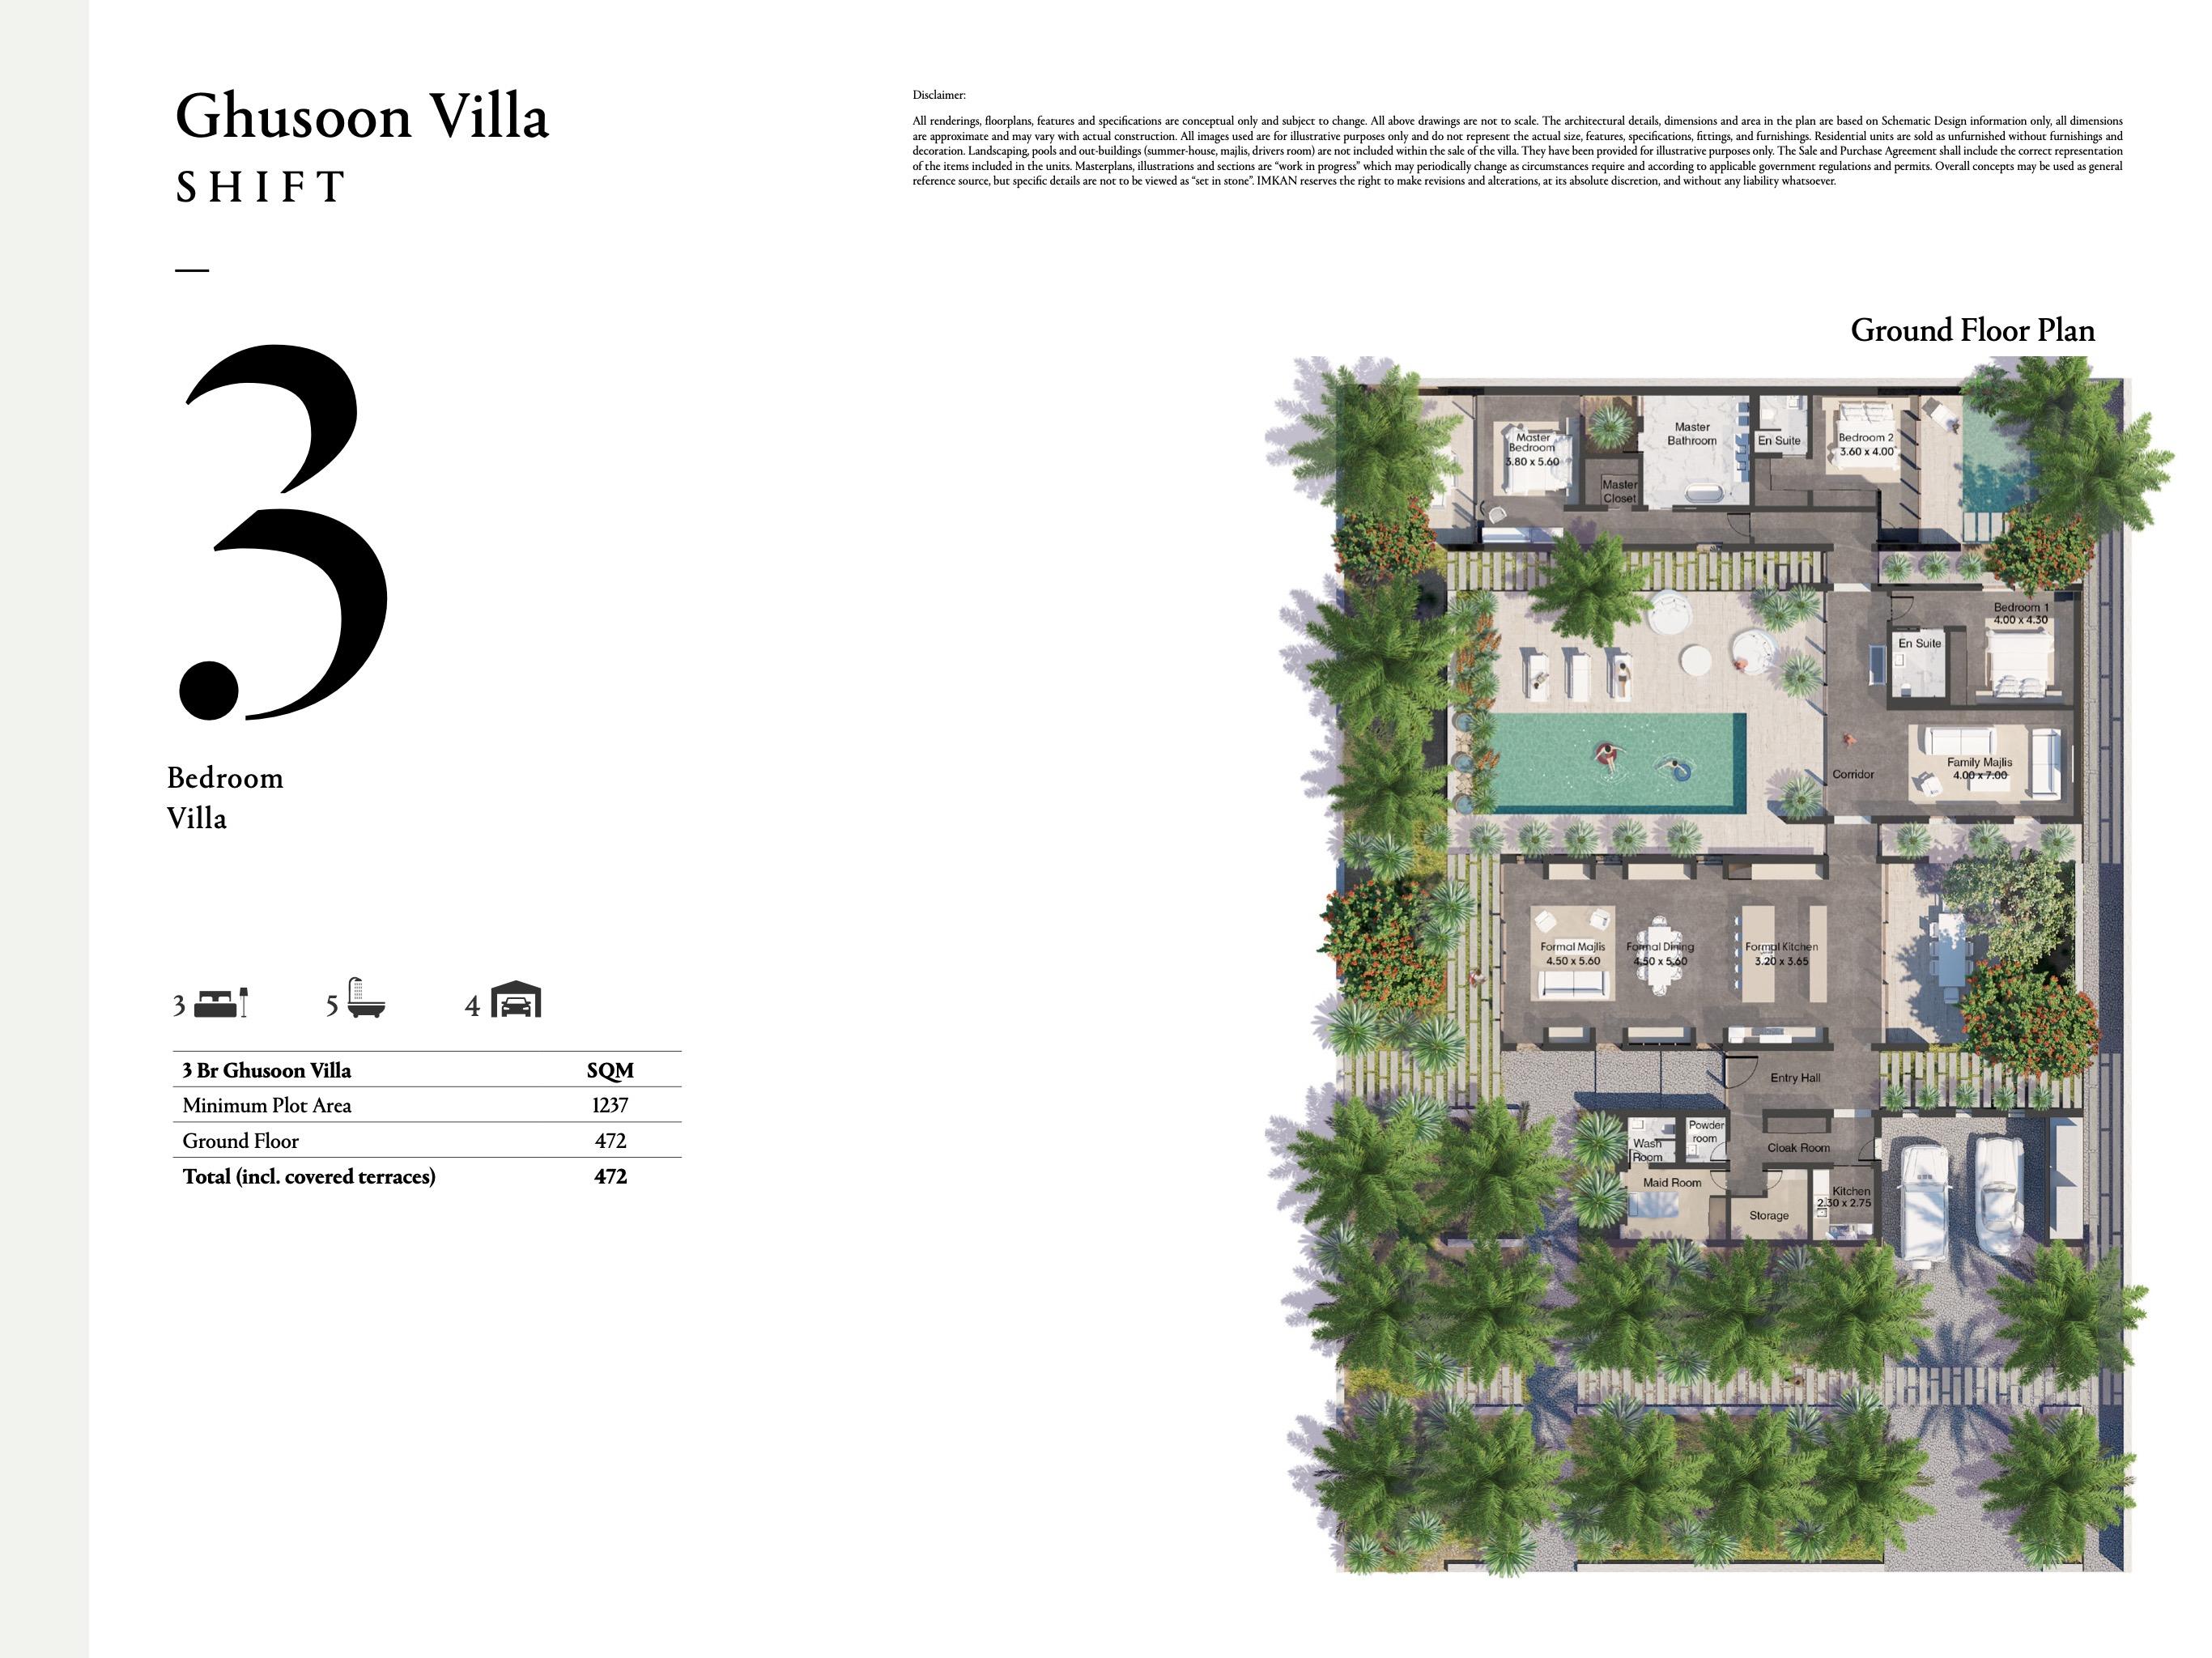 فيلا غصون - 3 غرف نوم بمساحة 472 متر مربع